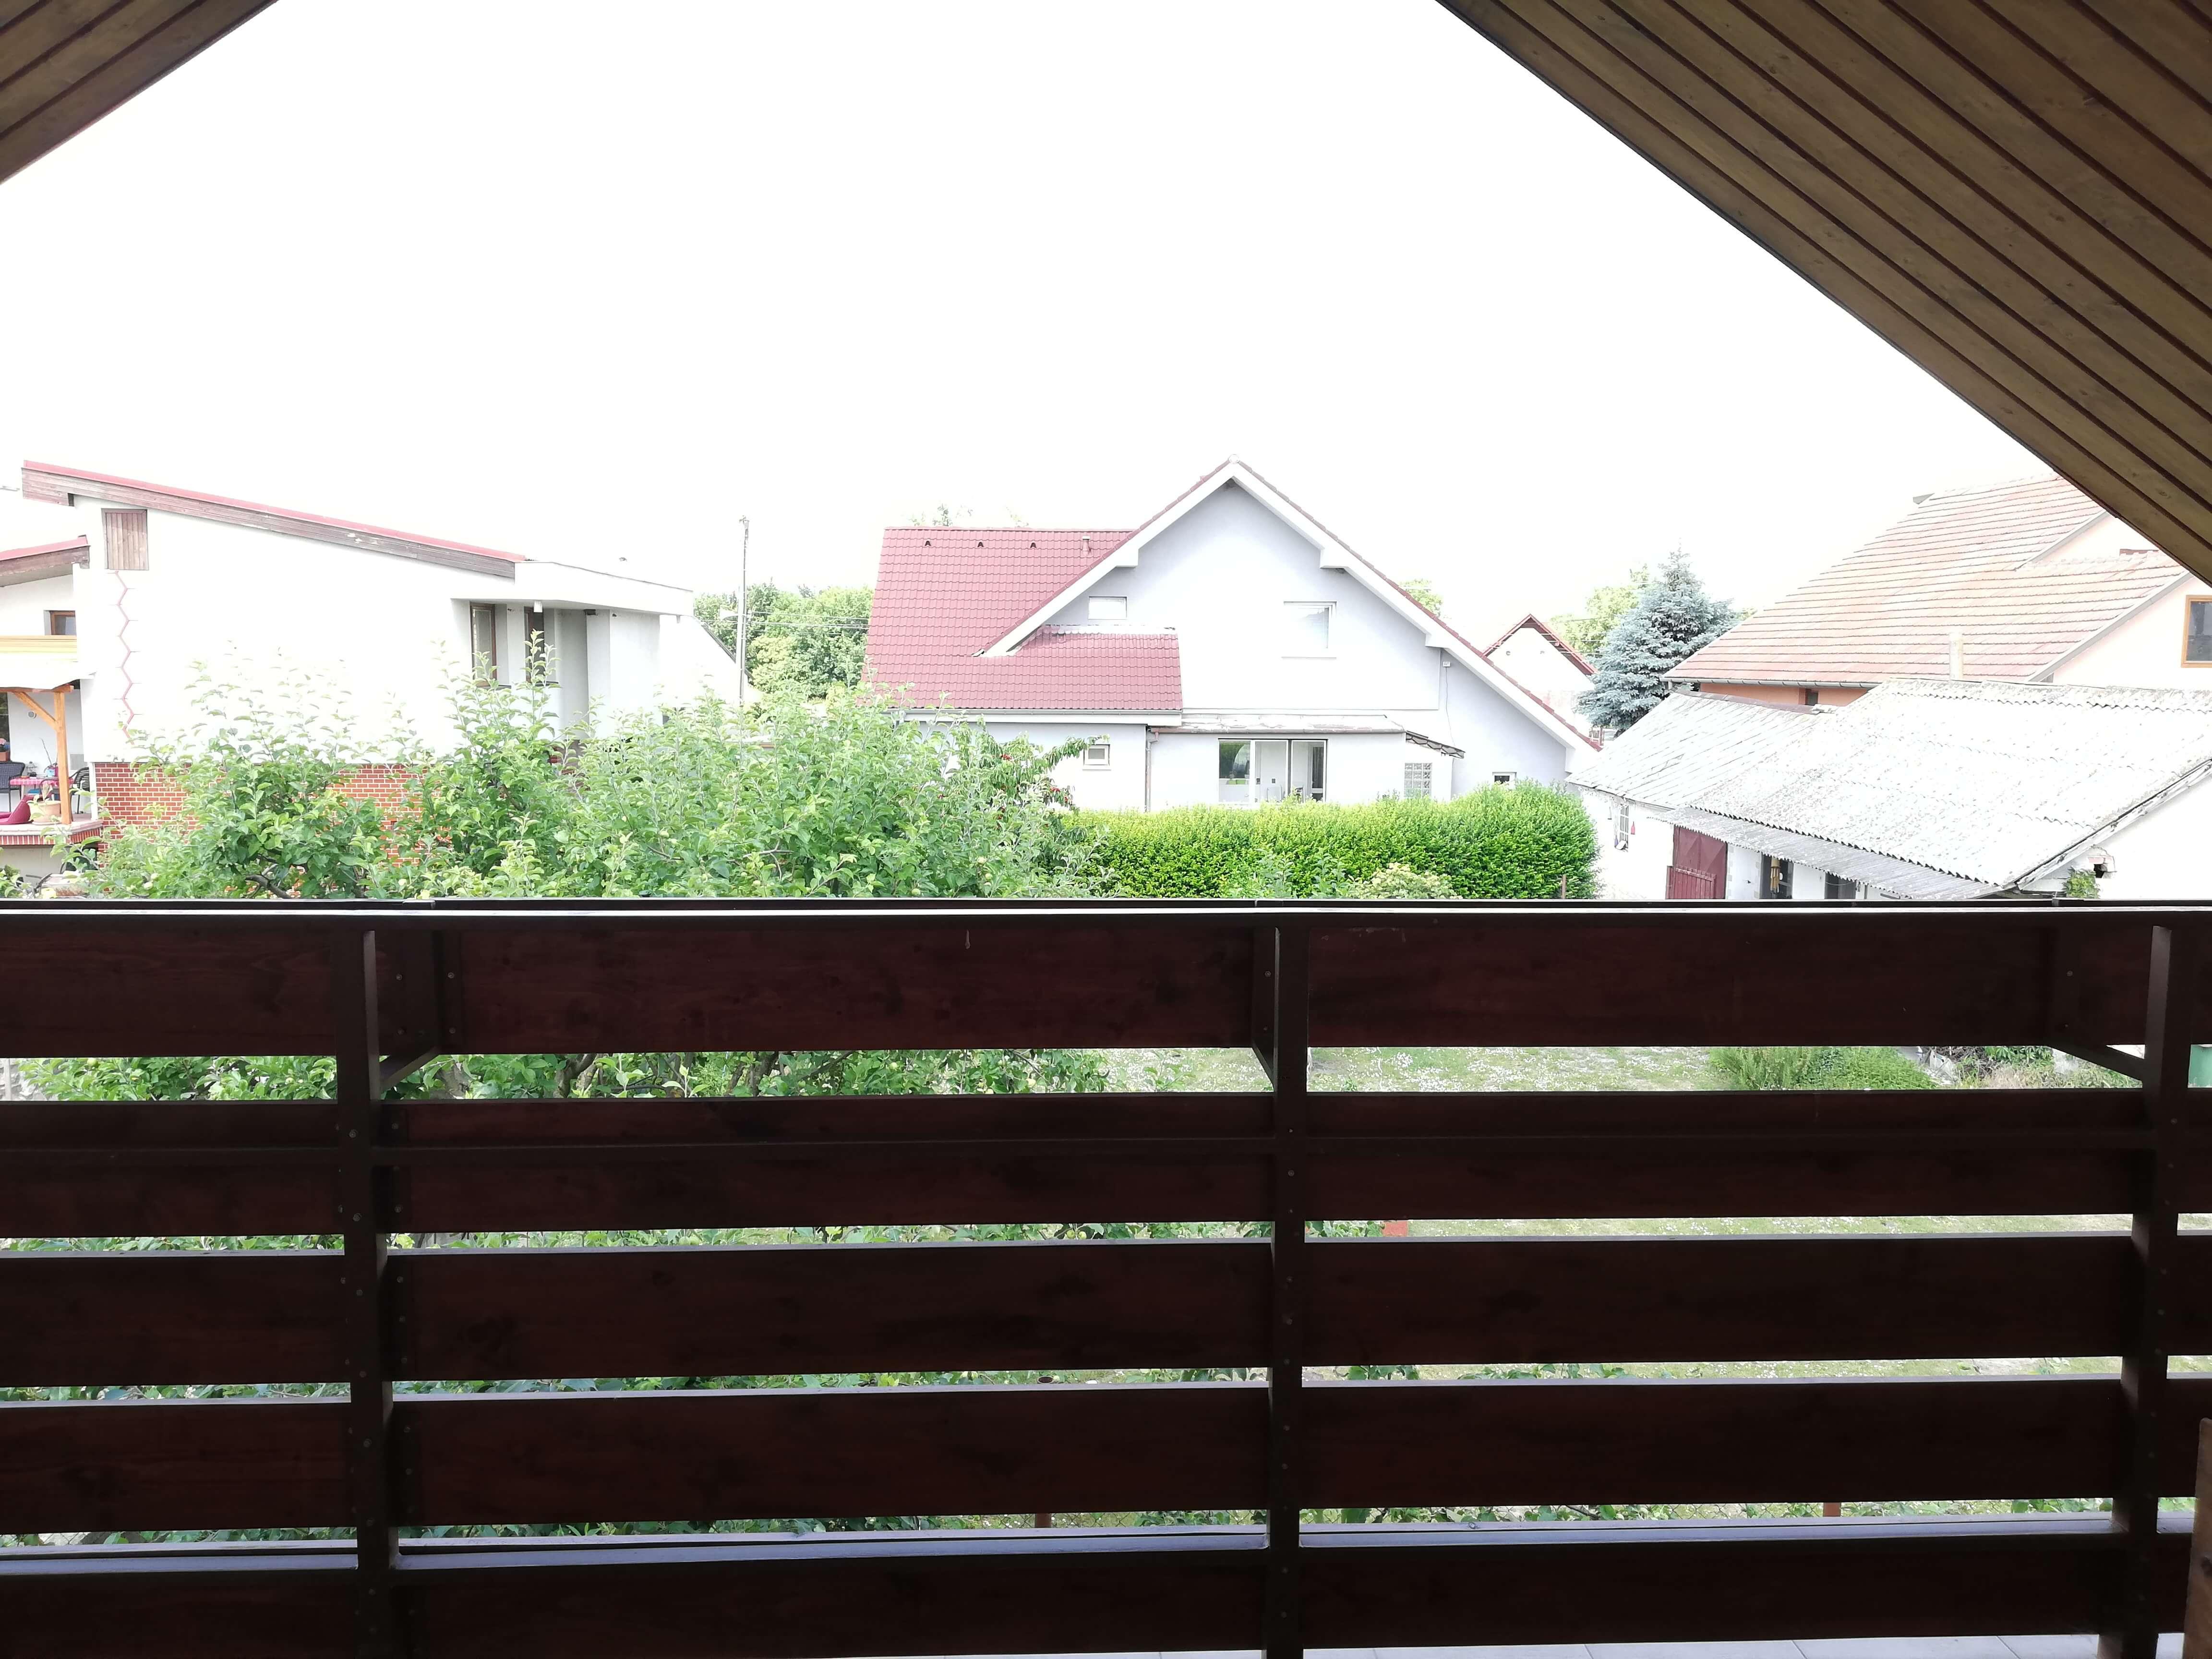 Rodinný dom na uzavretej ulici, Vojtechovce, 2 – generačný 6 izbový, úžitková 270m2, pozemok 600m2, garáž-15